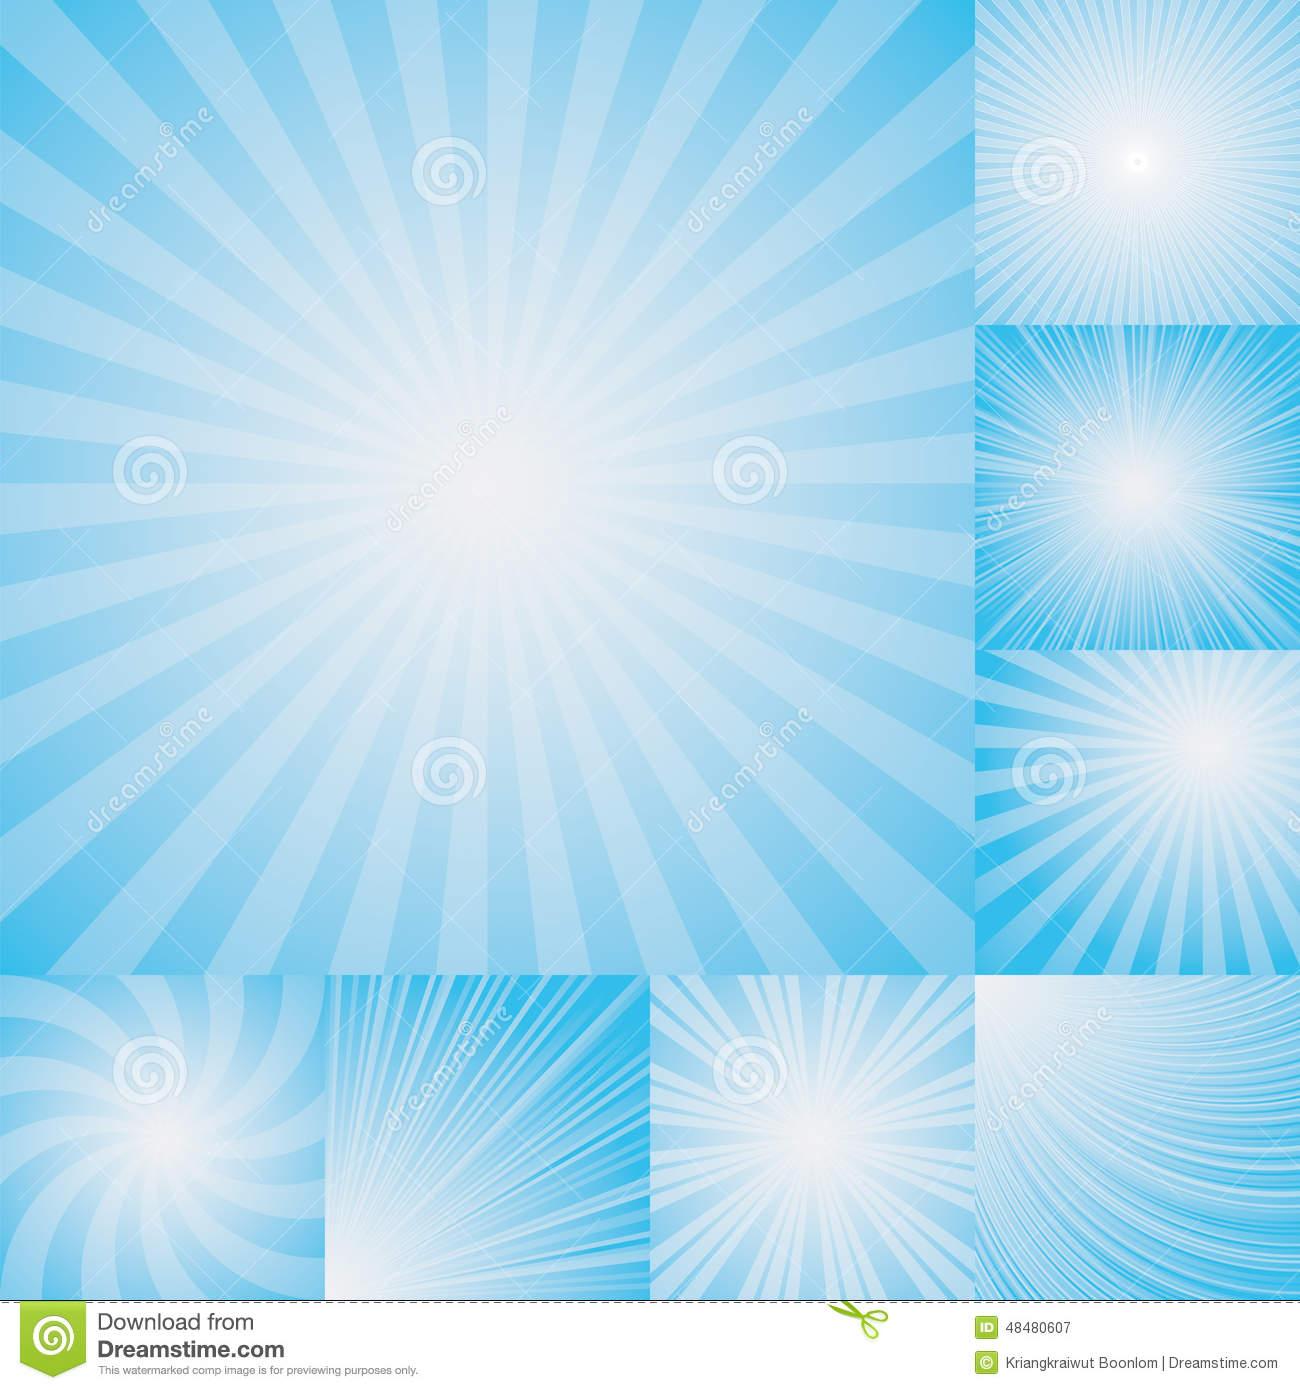 Light Blue clipart blue color Color clipart Of background no